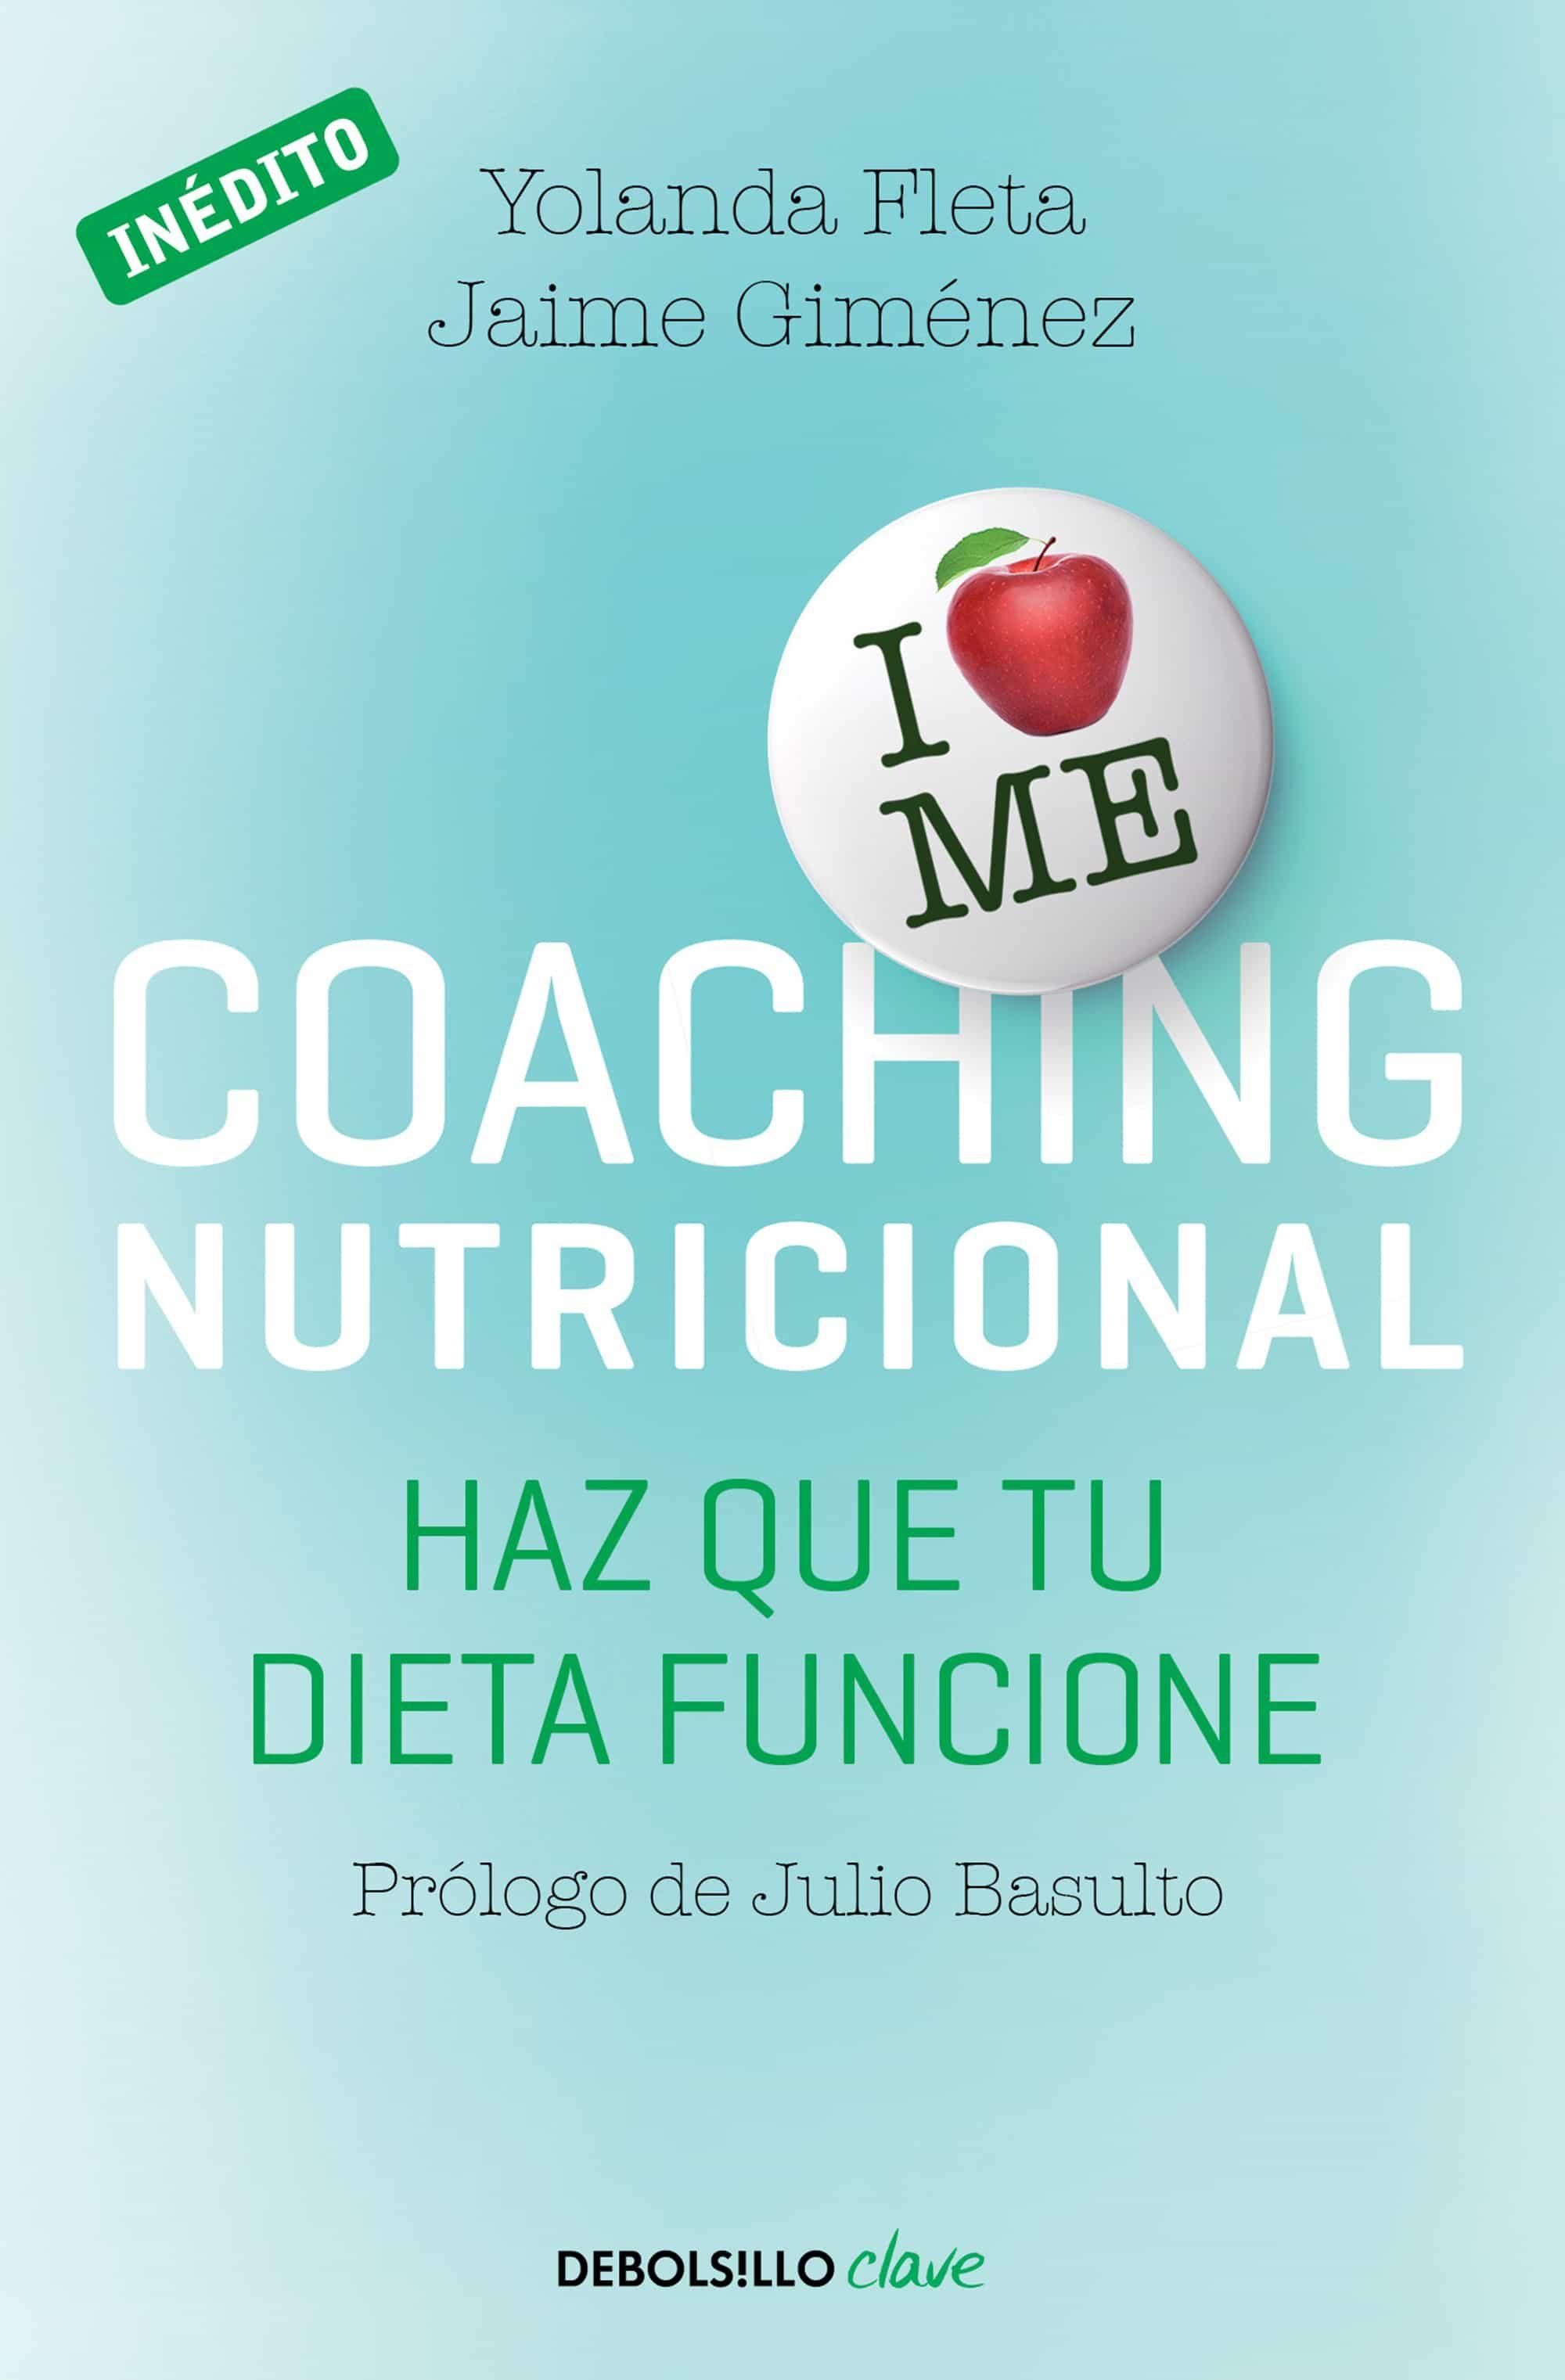 Coaching nutricional ebook yolanda fleta jaime gimenez 9788466329002